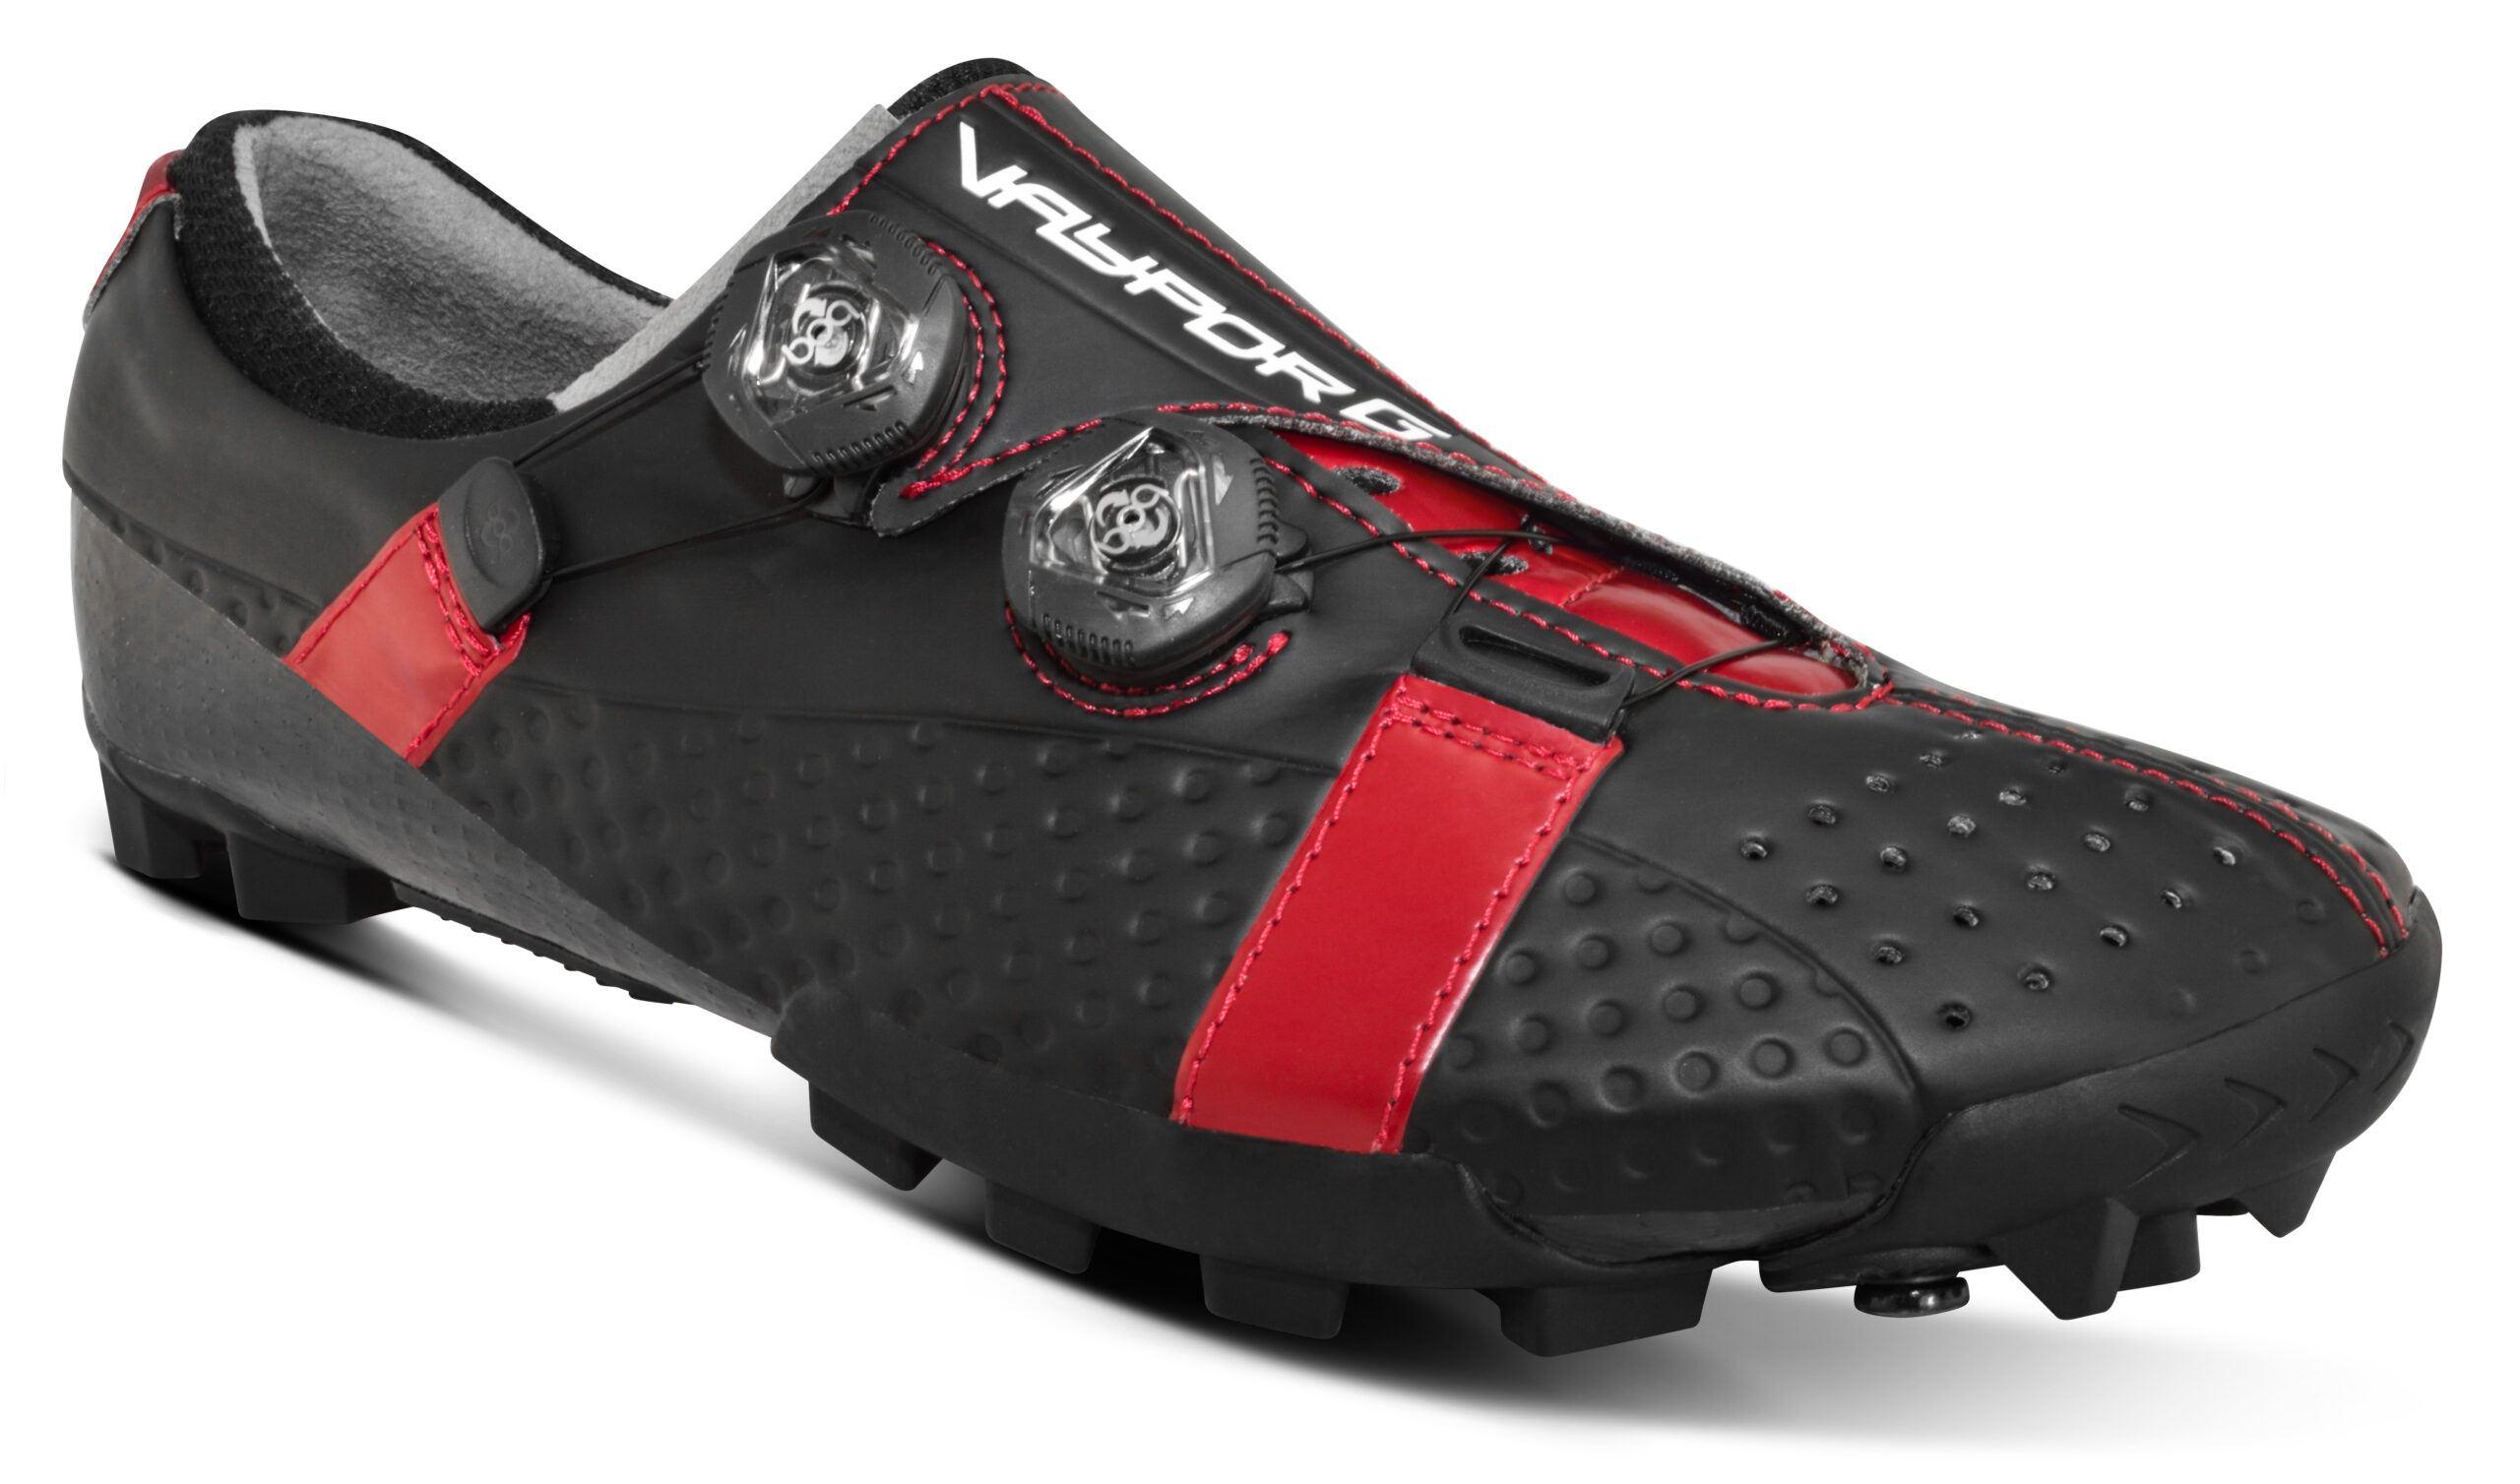 Vaypor G Matte Black-Shiny Red